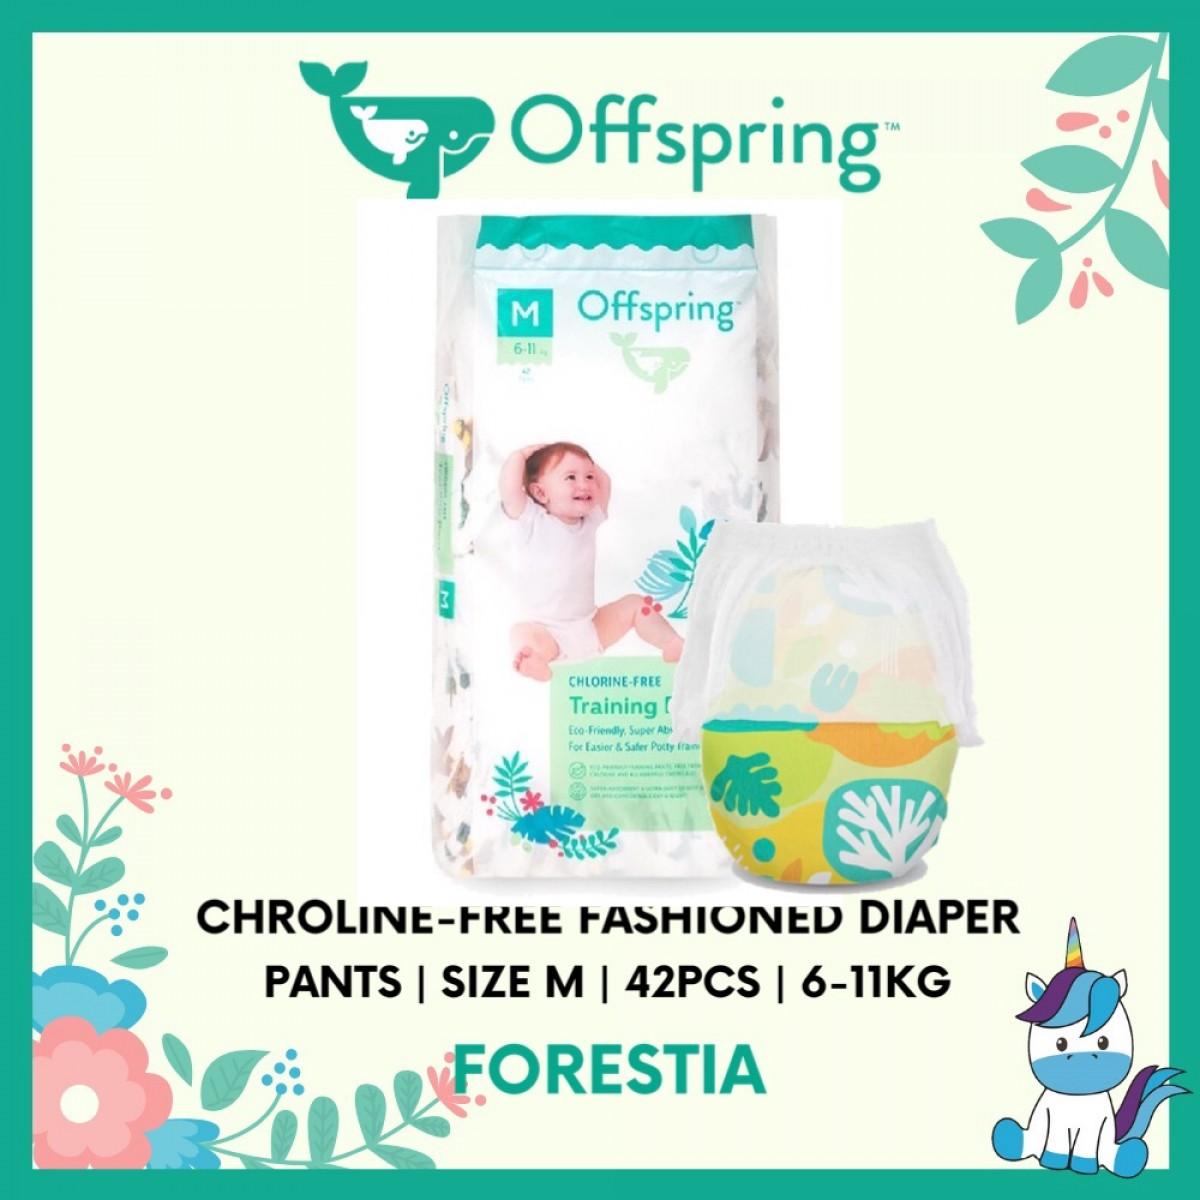 Offspring Chroline-Free Fashioned Pants Diaper M 42pcs - 9 Design